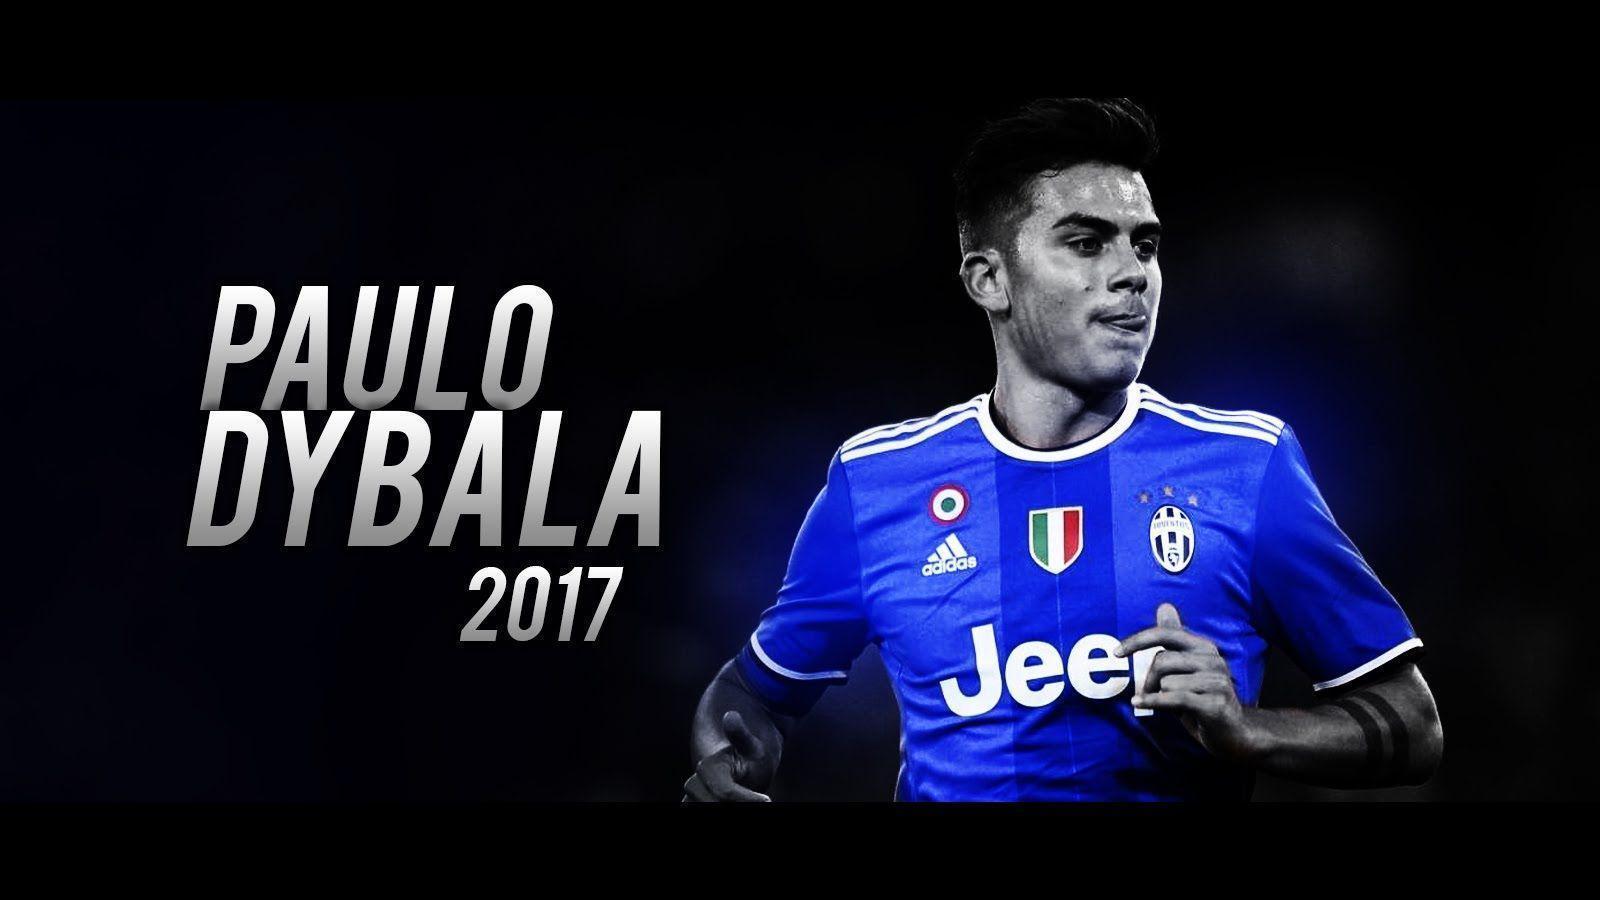 Paulo Dybala - Prodigy | Pre Season 2017 HD - YouTube